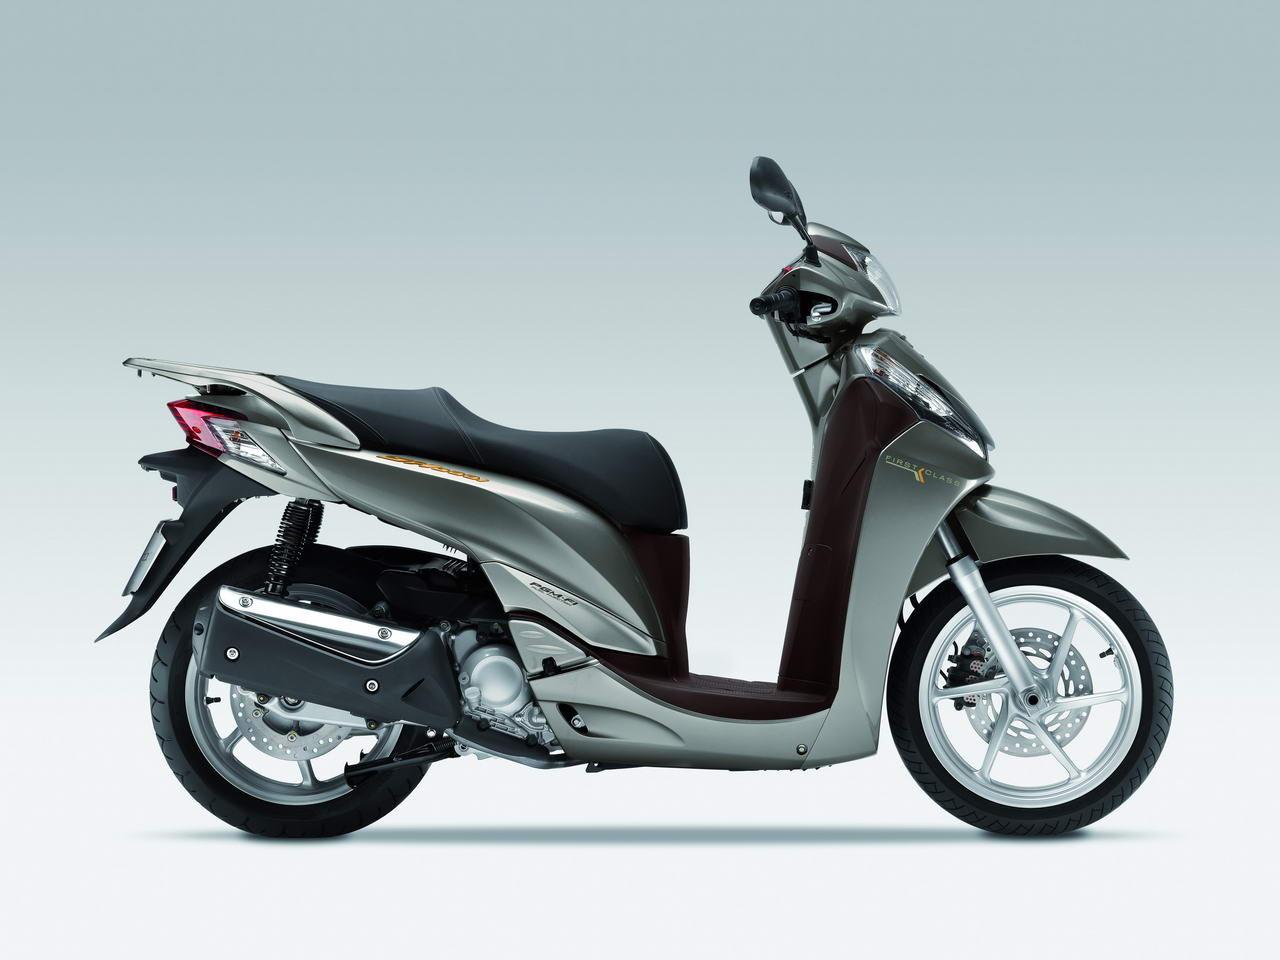 Listino Honda Integra 750 ABSS Scooter oltre 300 - image 14714_honda-sh300ispecial-abs on http://moto.motori.net